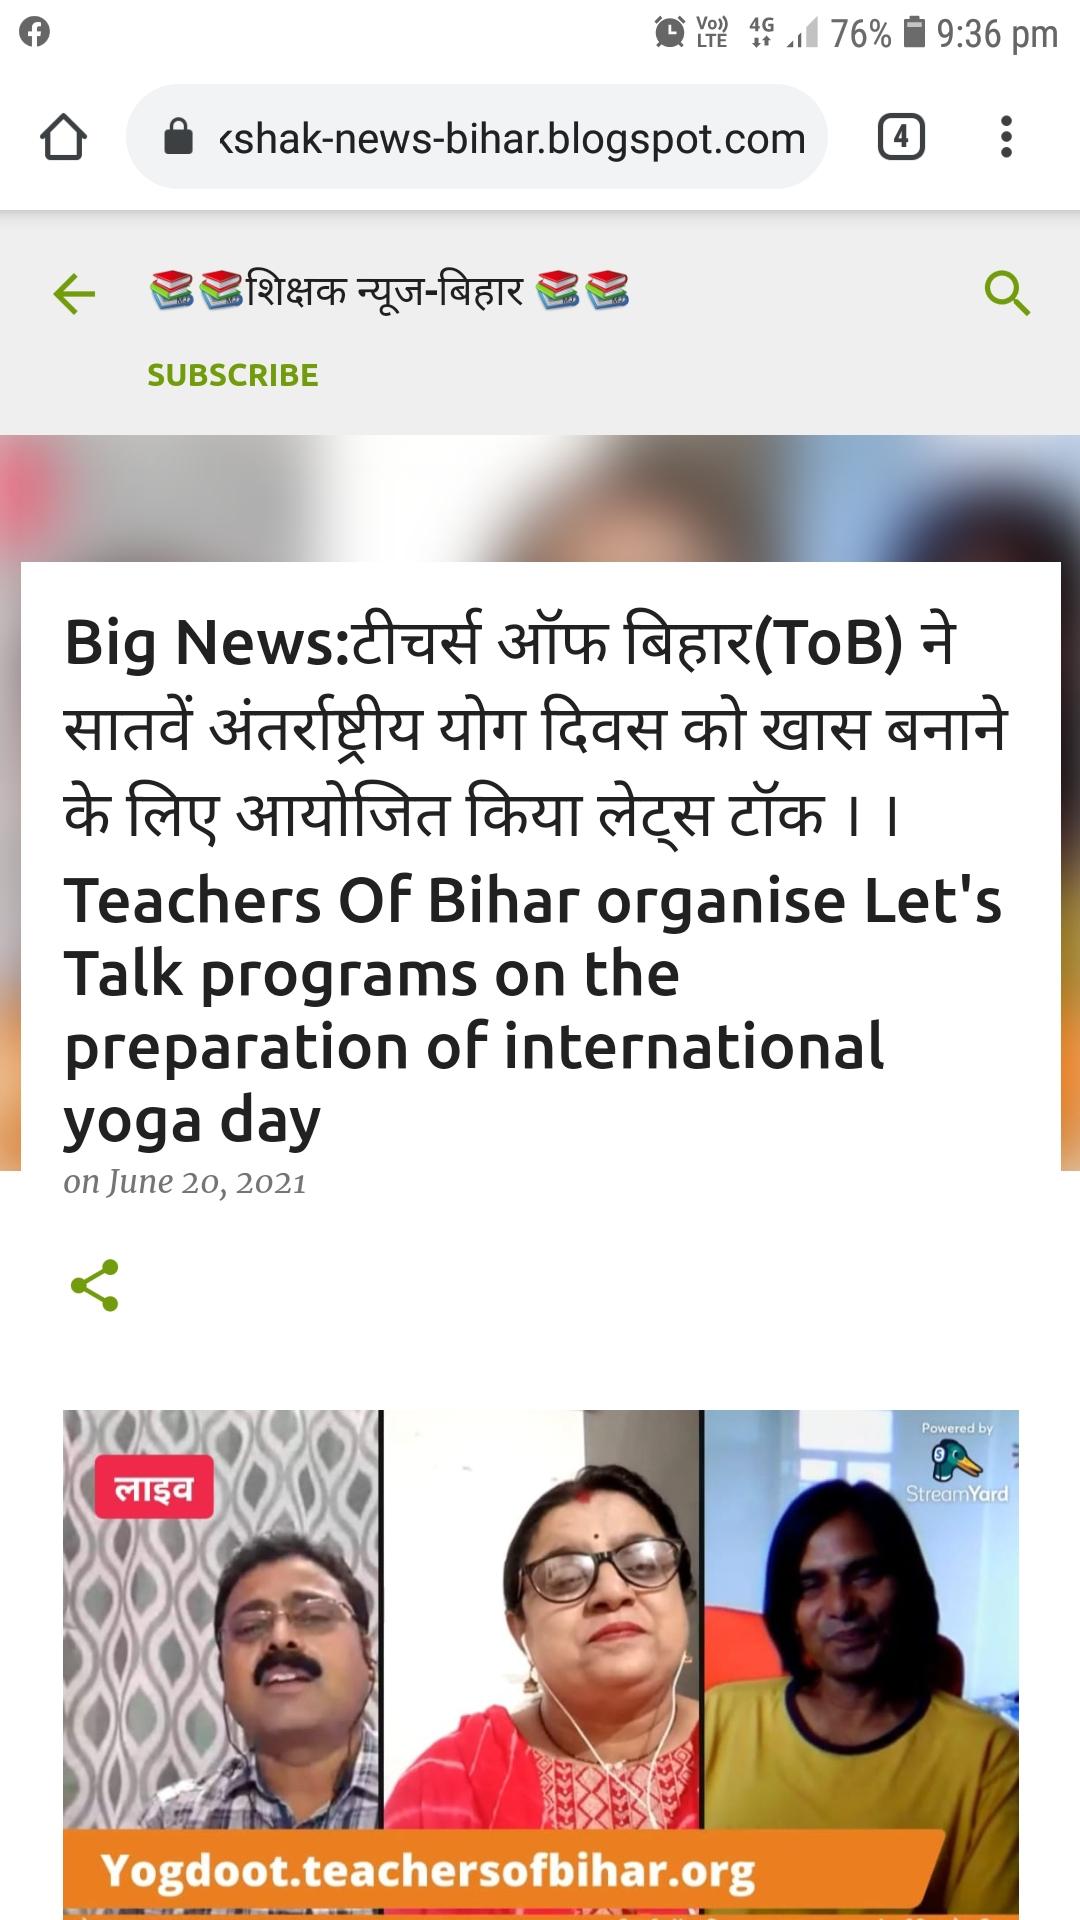 Let's Talk on Yoga, 20.06.2021